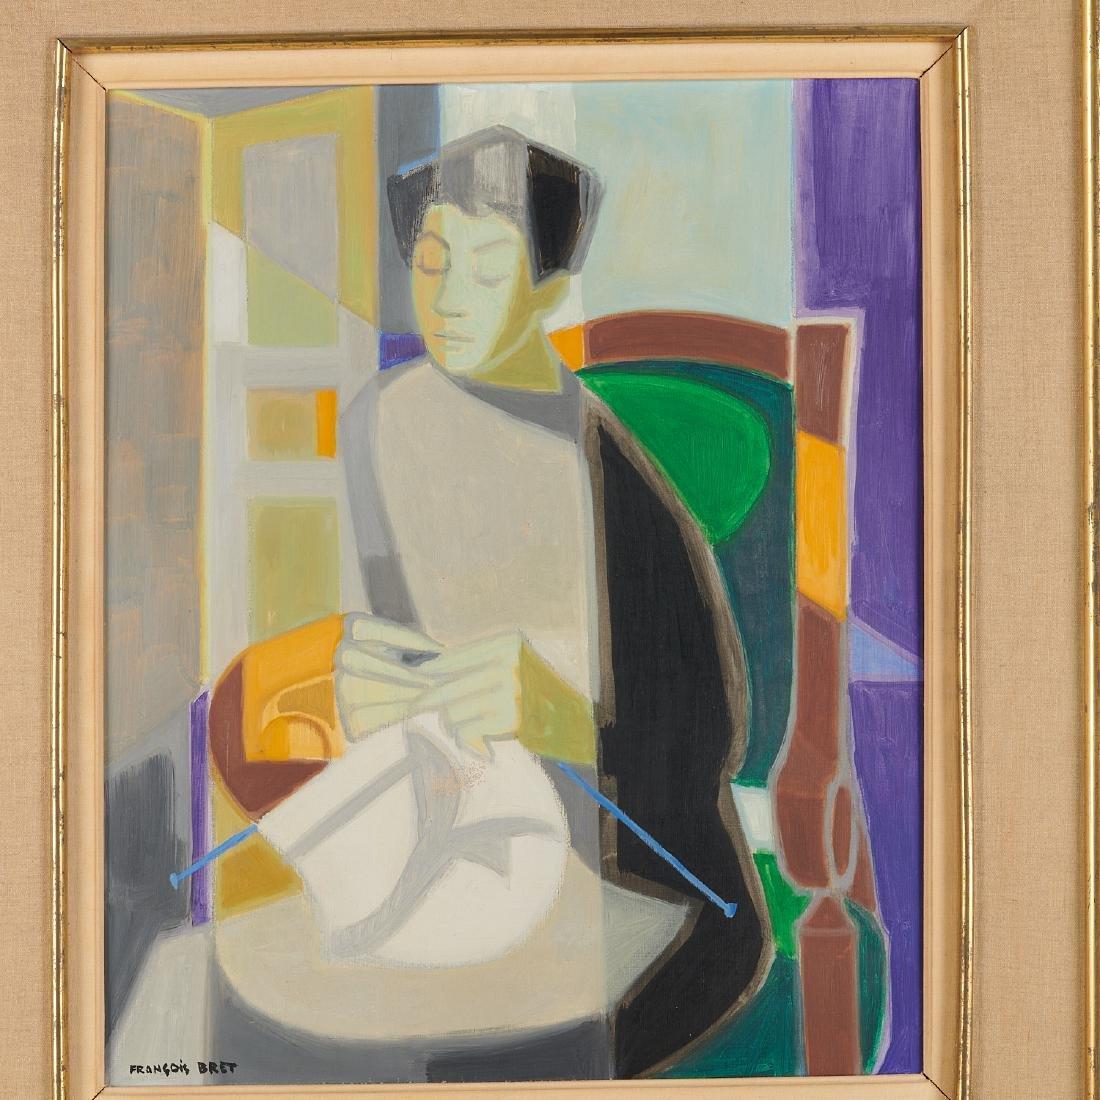 Francois Bret, painting, 1958 - 2